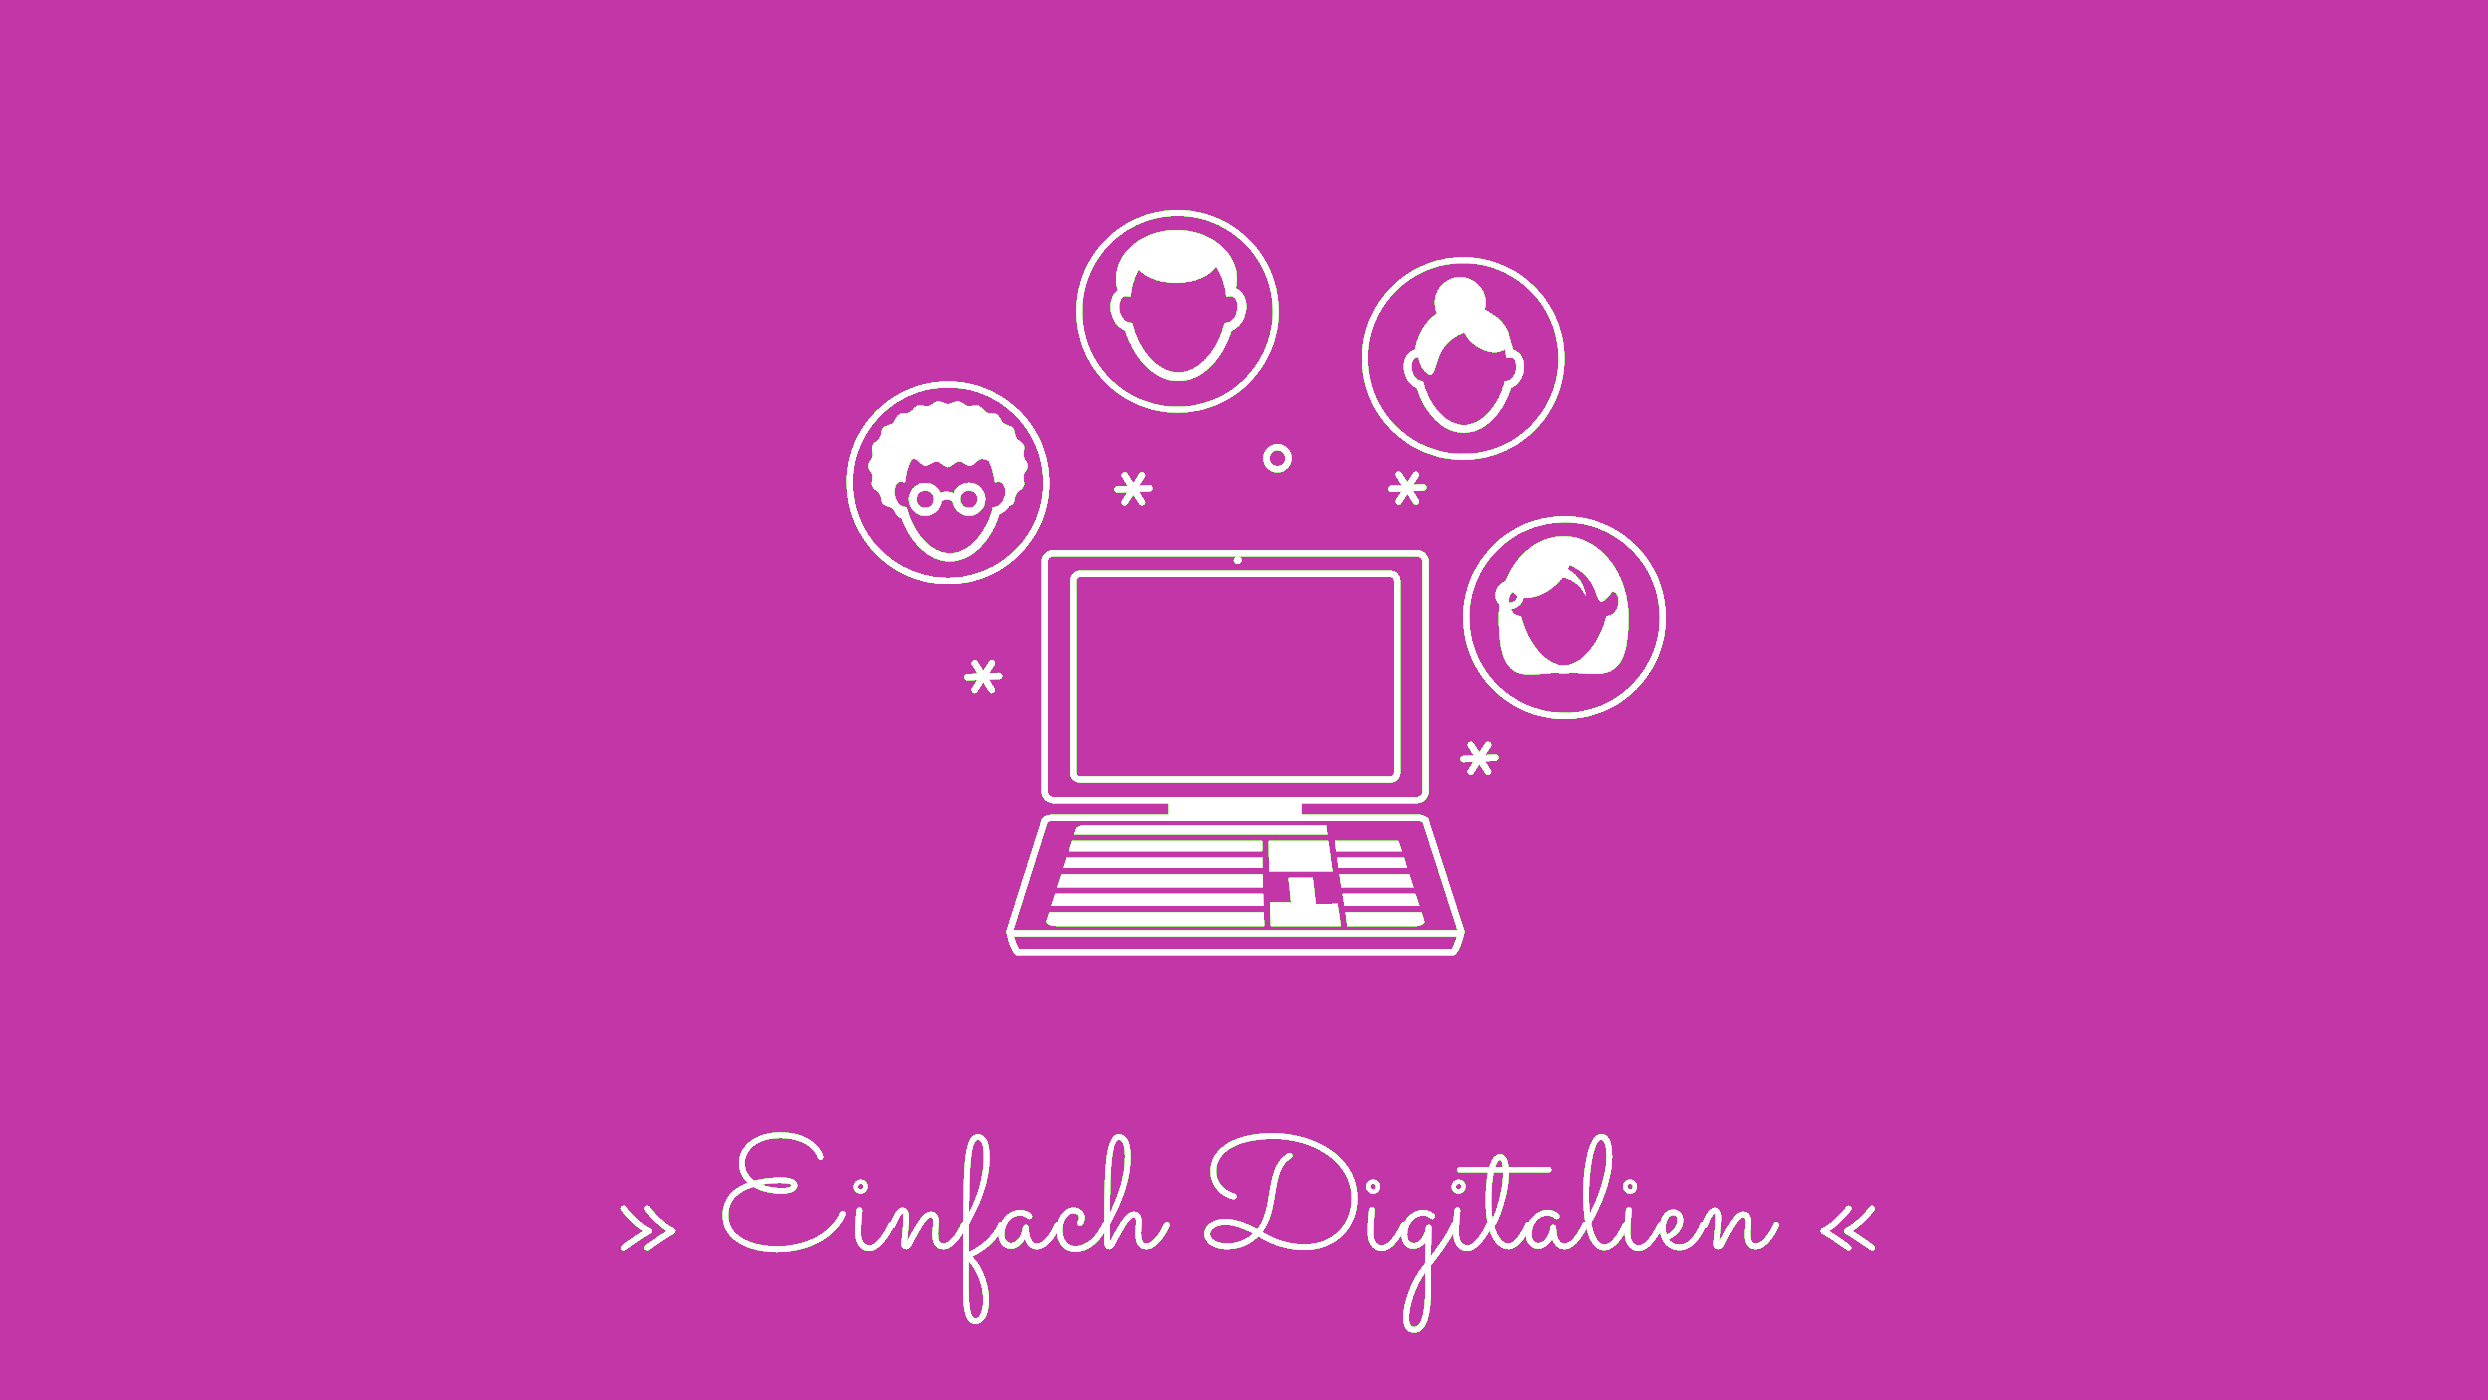 Visual Einfach Digitalien by DoSchu